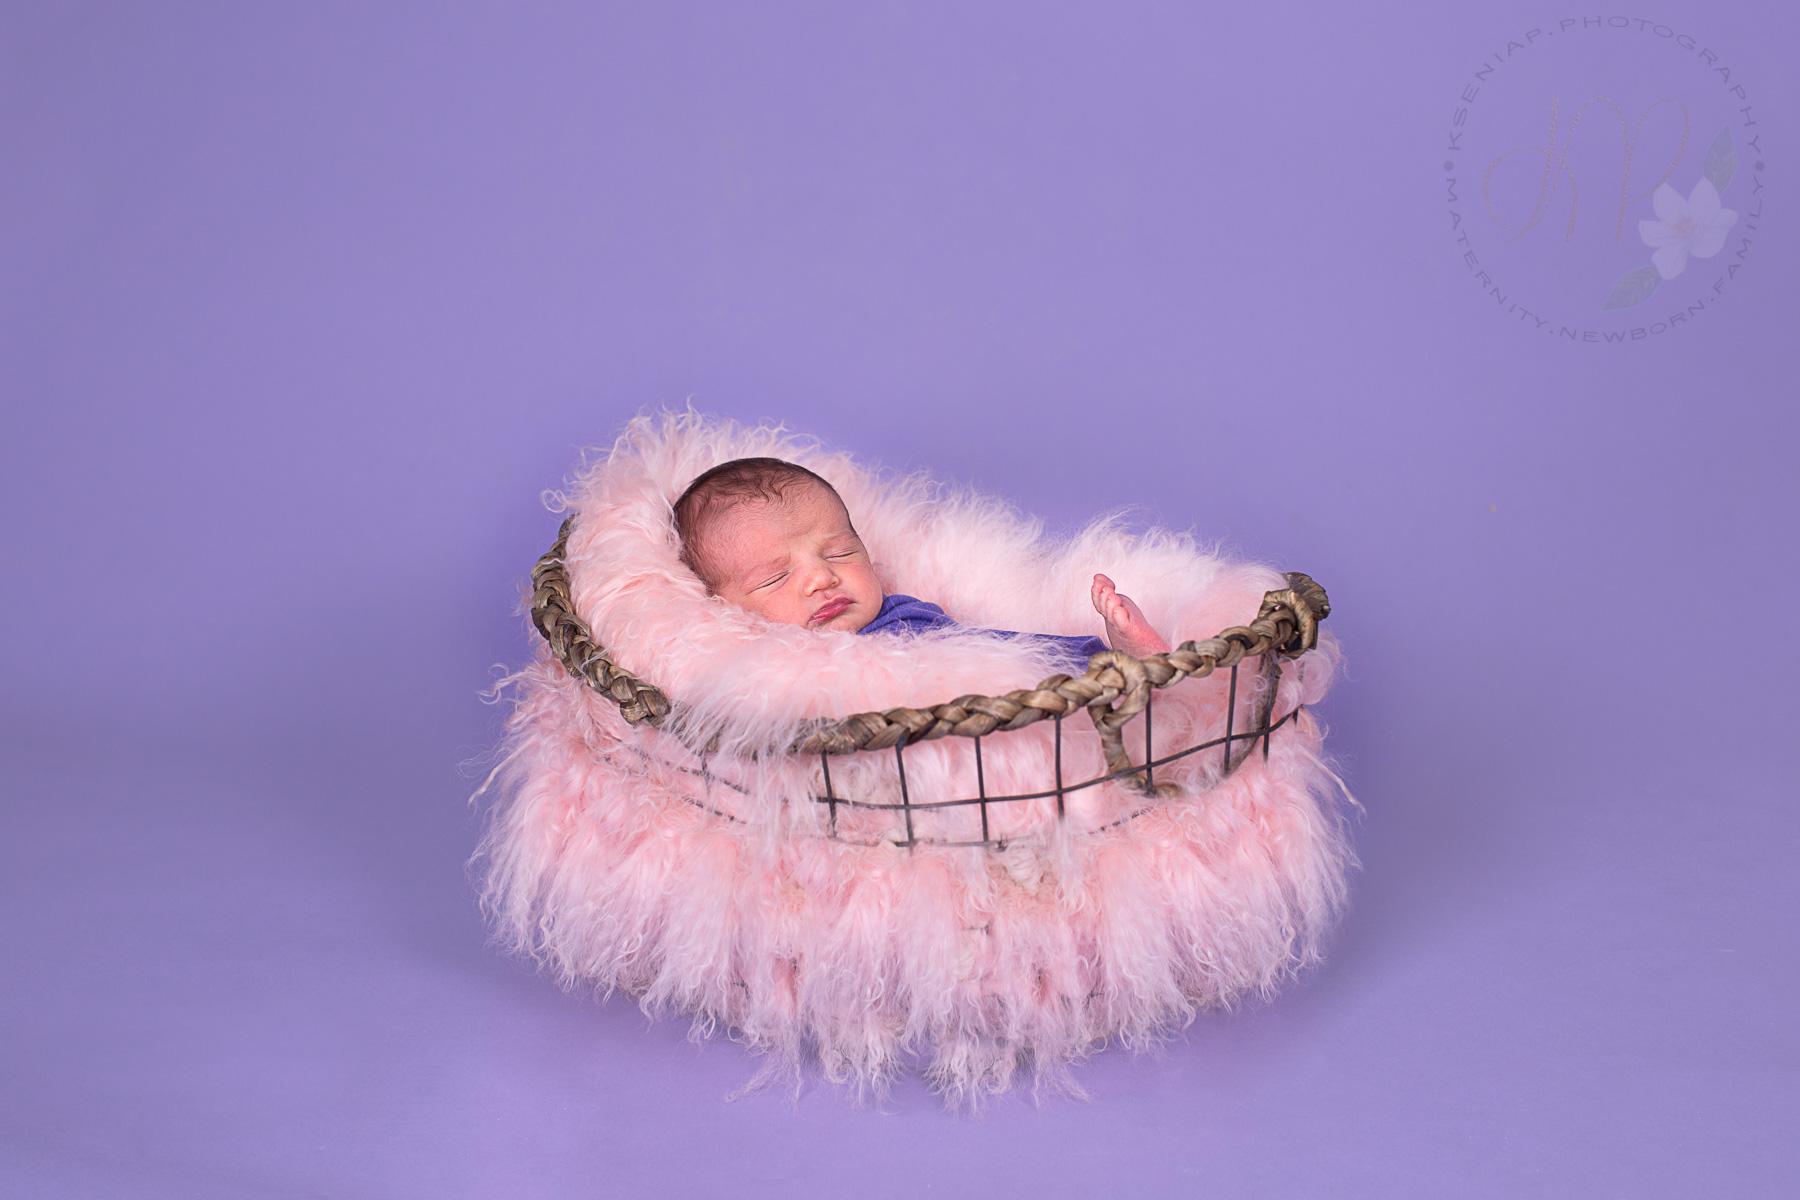 Image of baby sleeping in the basket